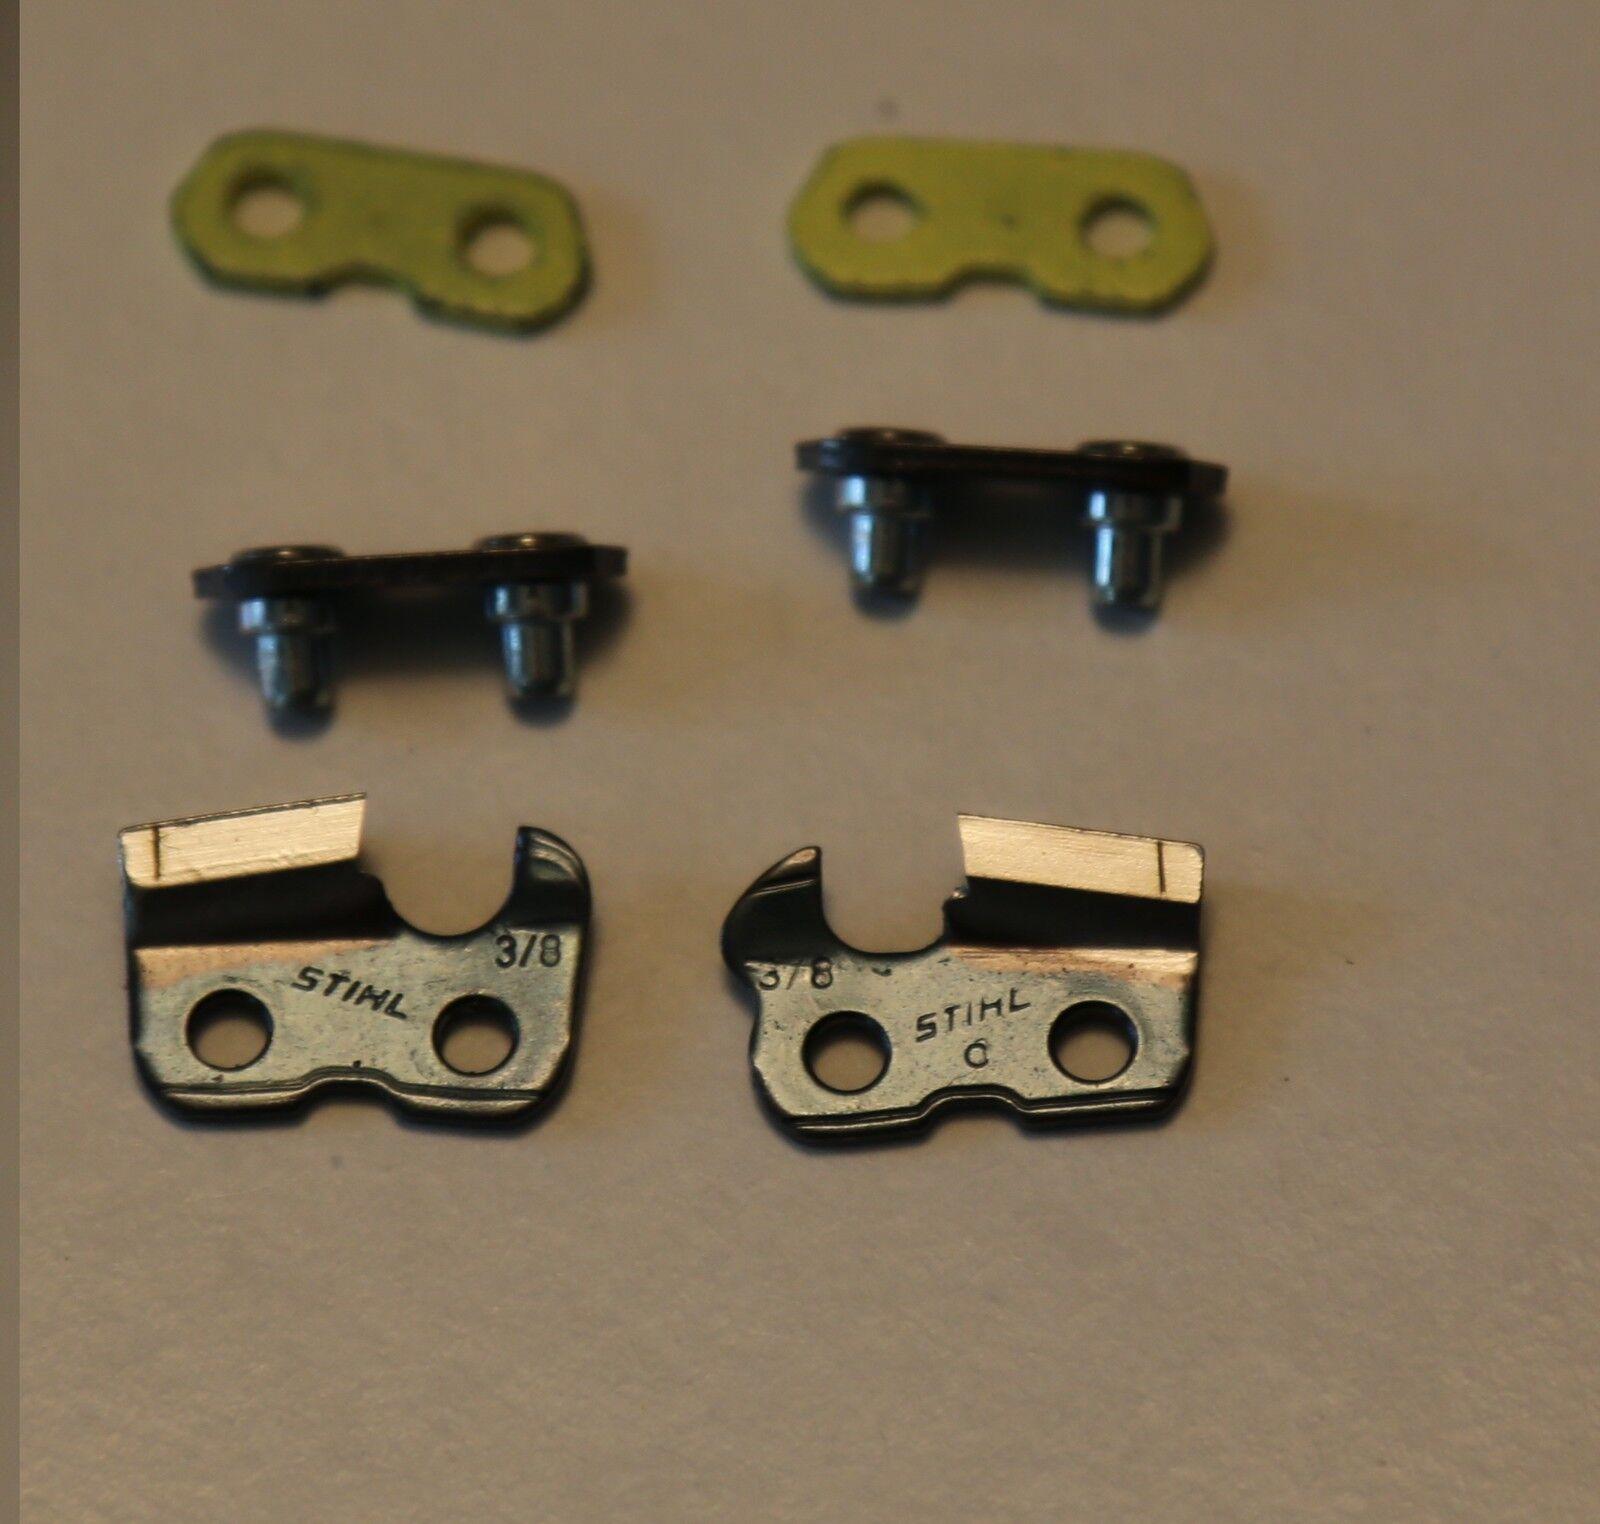 STIHL 3//8 chain 36 inch bar 124 drivers .050 gauge full chisel full skip RSLFK